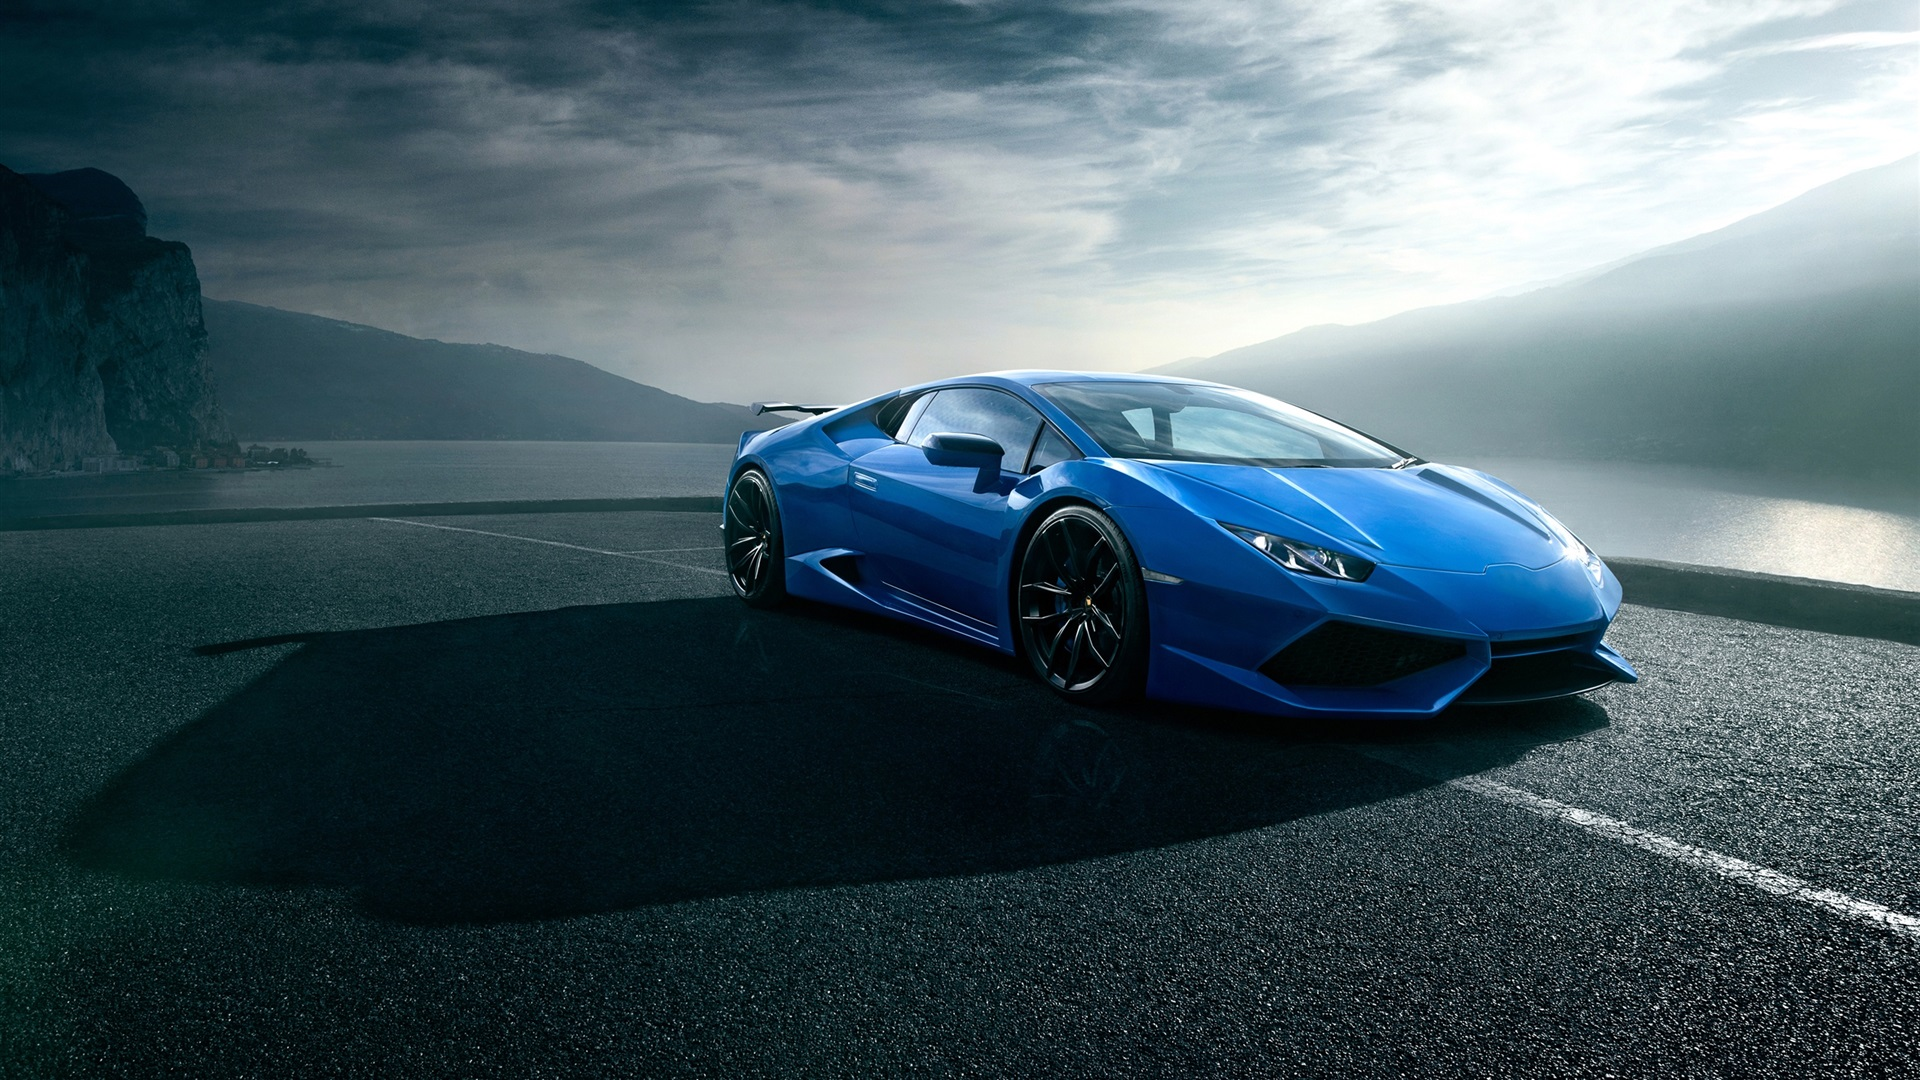 Download Wallpaper 1920x1080 Lamborghini Huracan Blue Luxury Supercar Road Clouds Full Hd